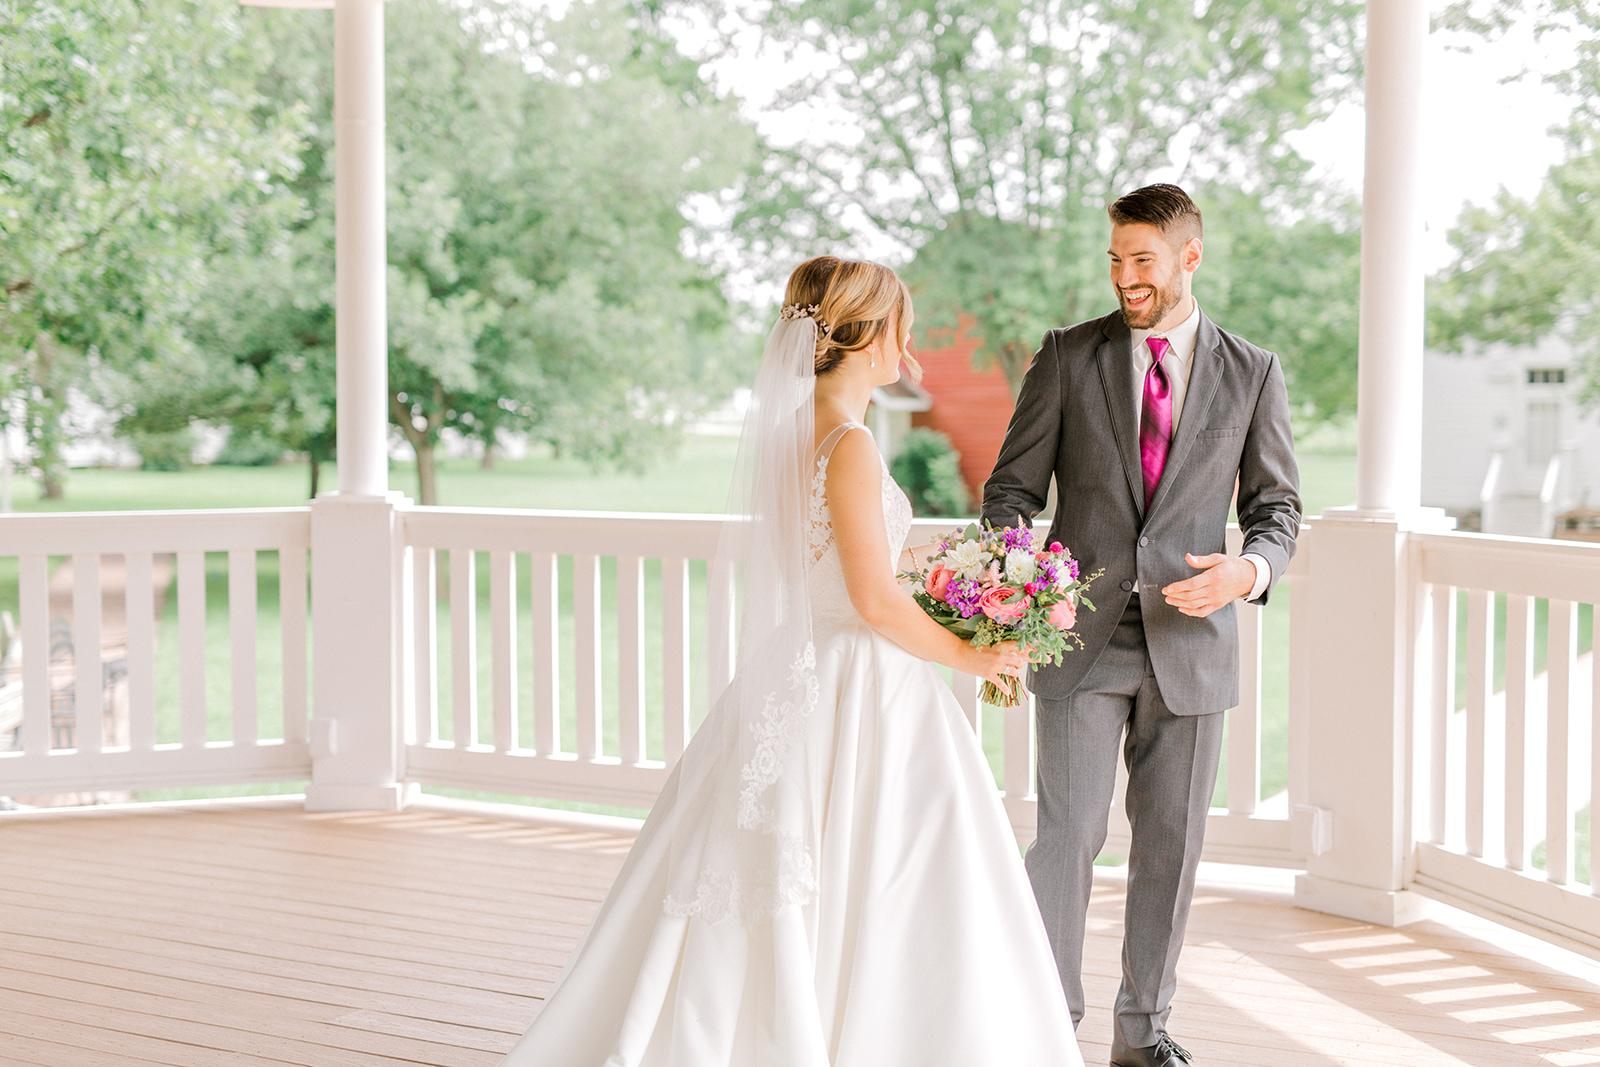 Ushers_Ferry_Cedar_Rapids_Wedding_Ella+Phil-0366.jpg